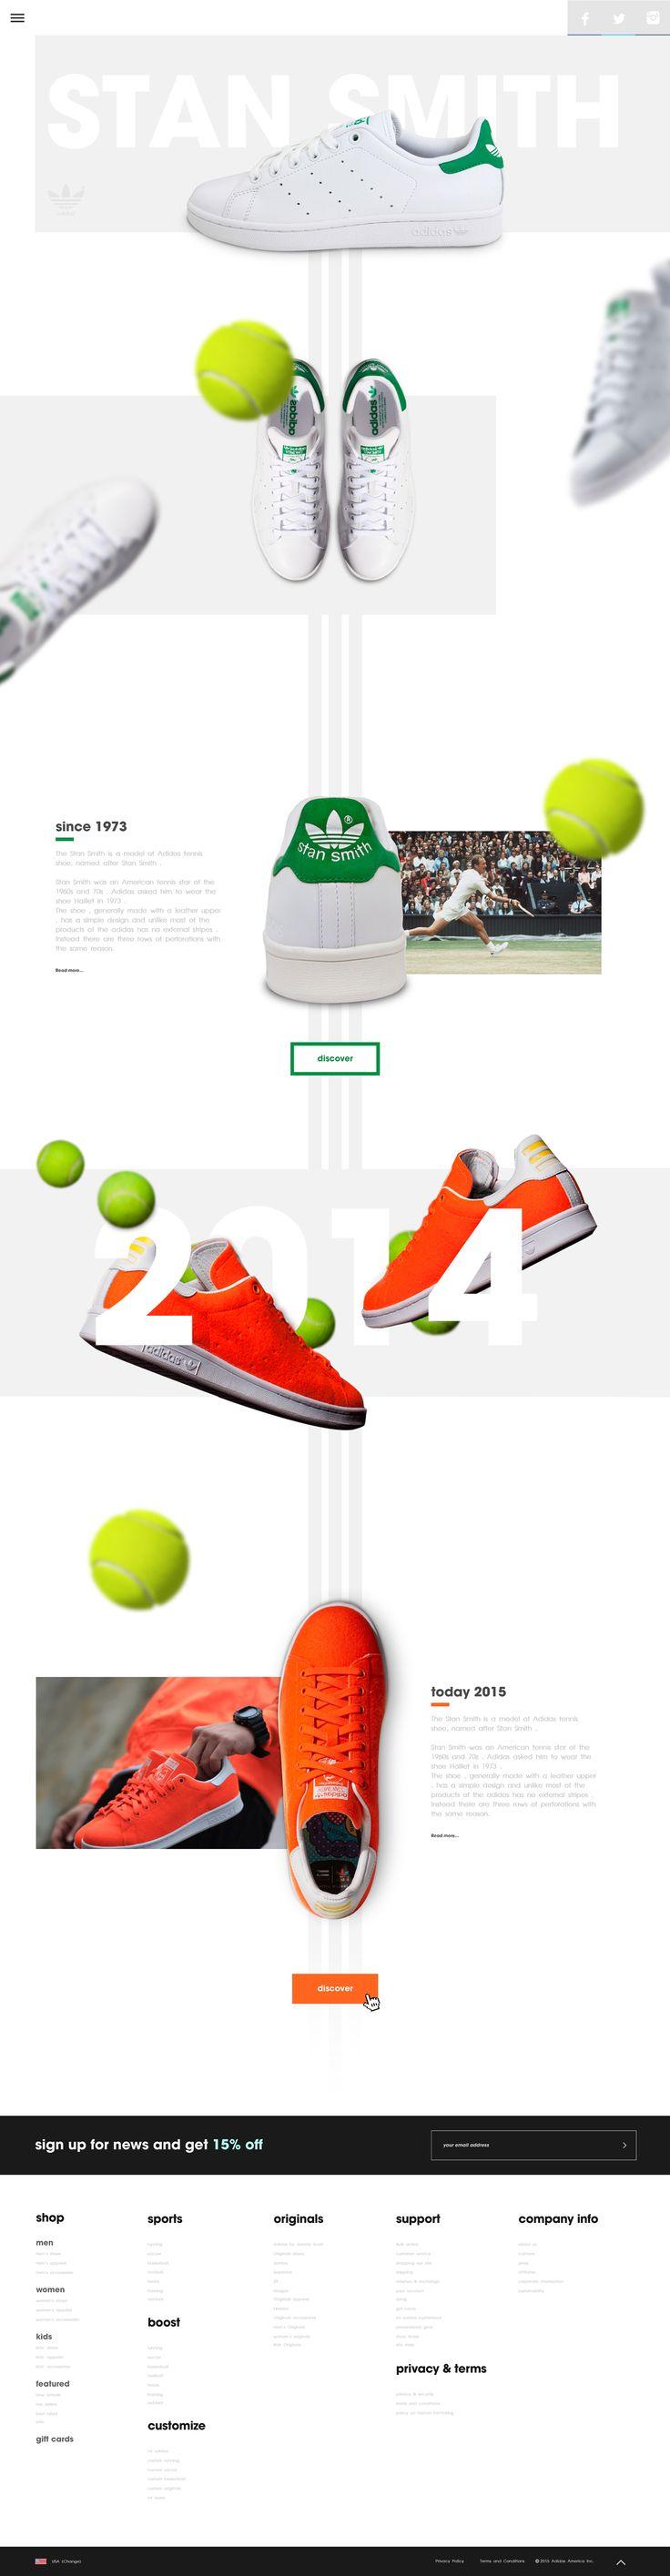 Adidas Web Design Web Design Adidas | 6695888 - rspr.host